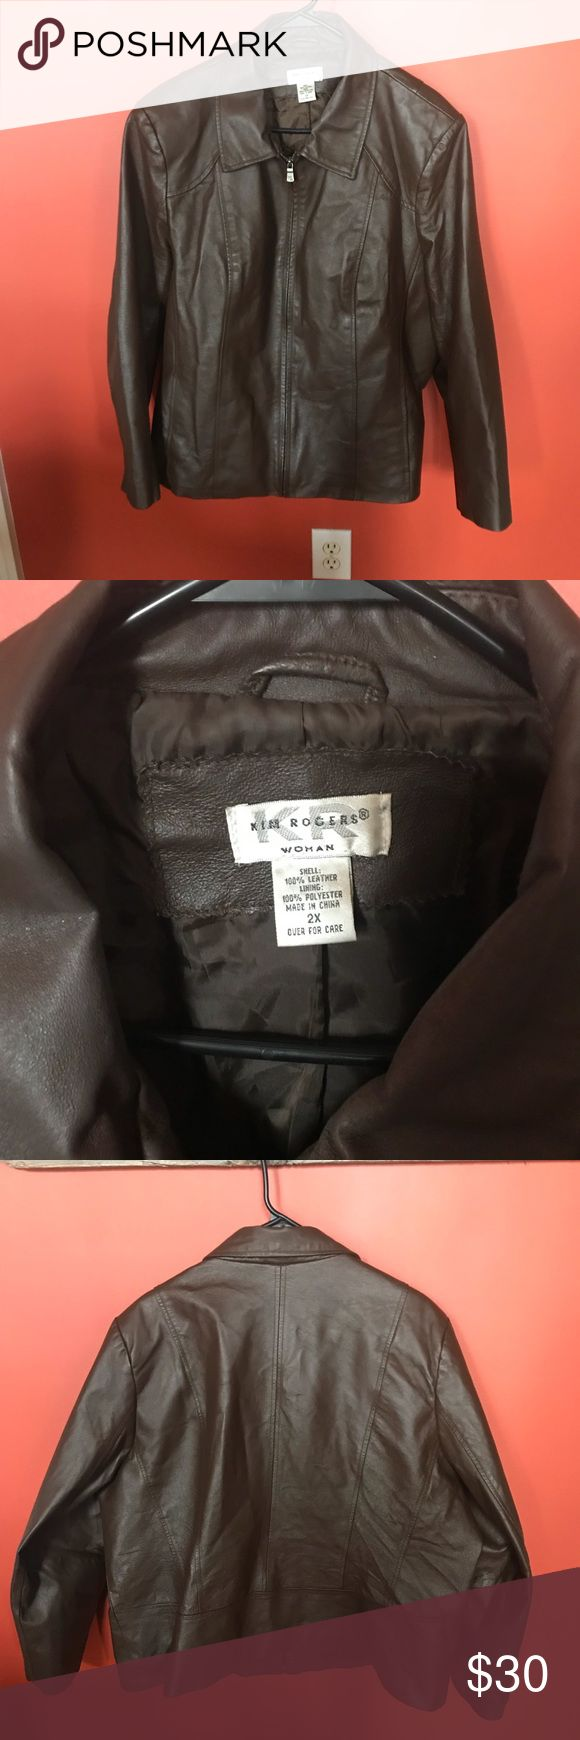 Ann Rogers brown zip up coat size 2x Ann Rogers brown zip up coat size 2x Jackets & Coats Blazers